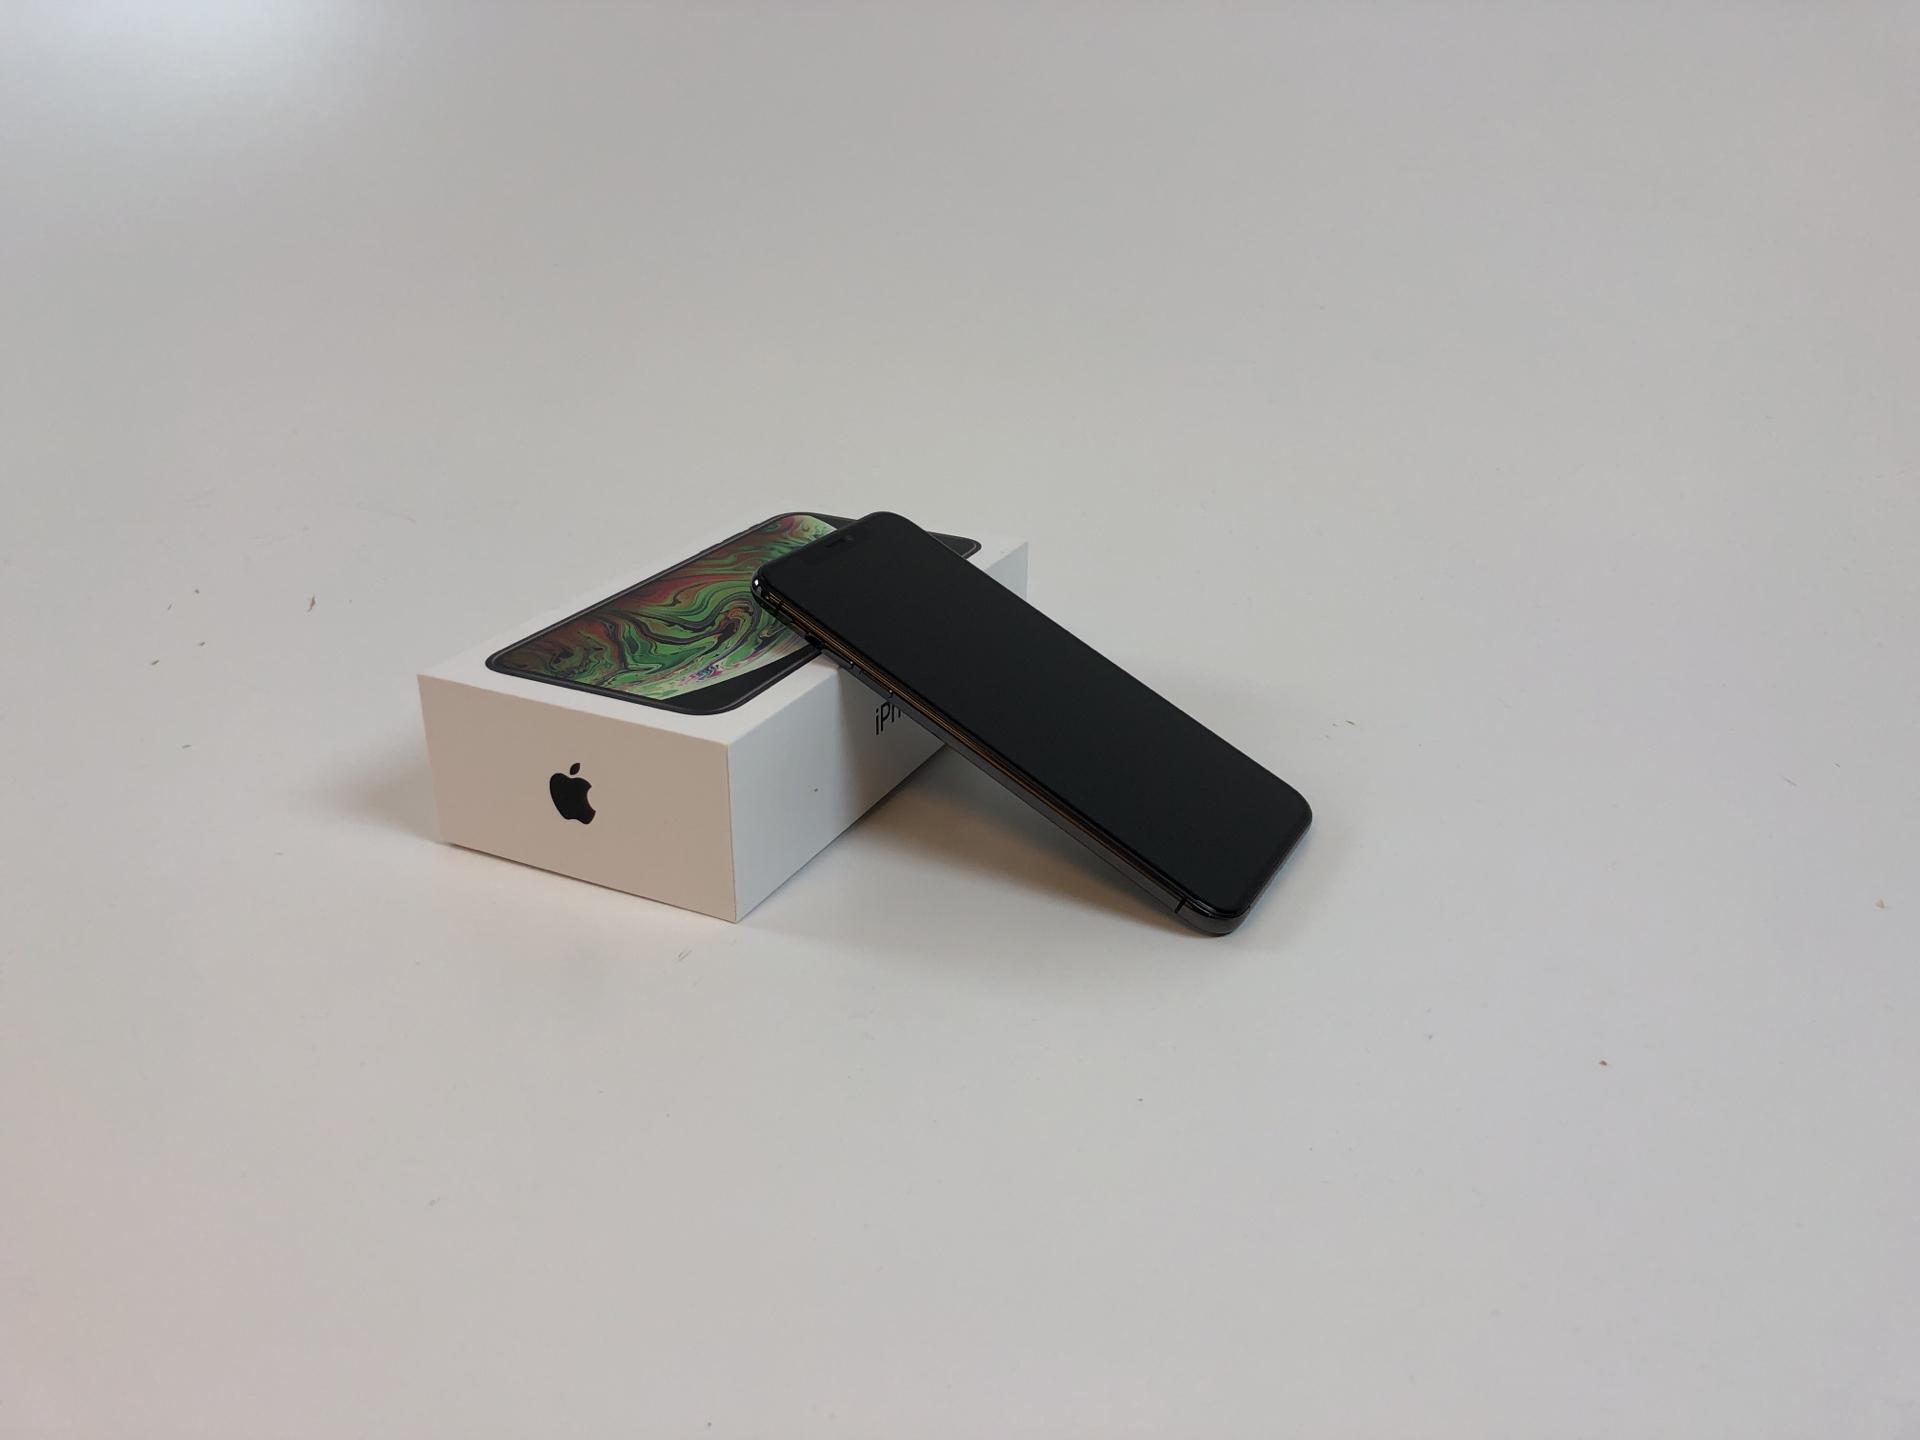 iPhone XS Max 256GB, 256GB, Space Gray, bild 3